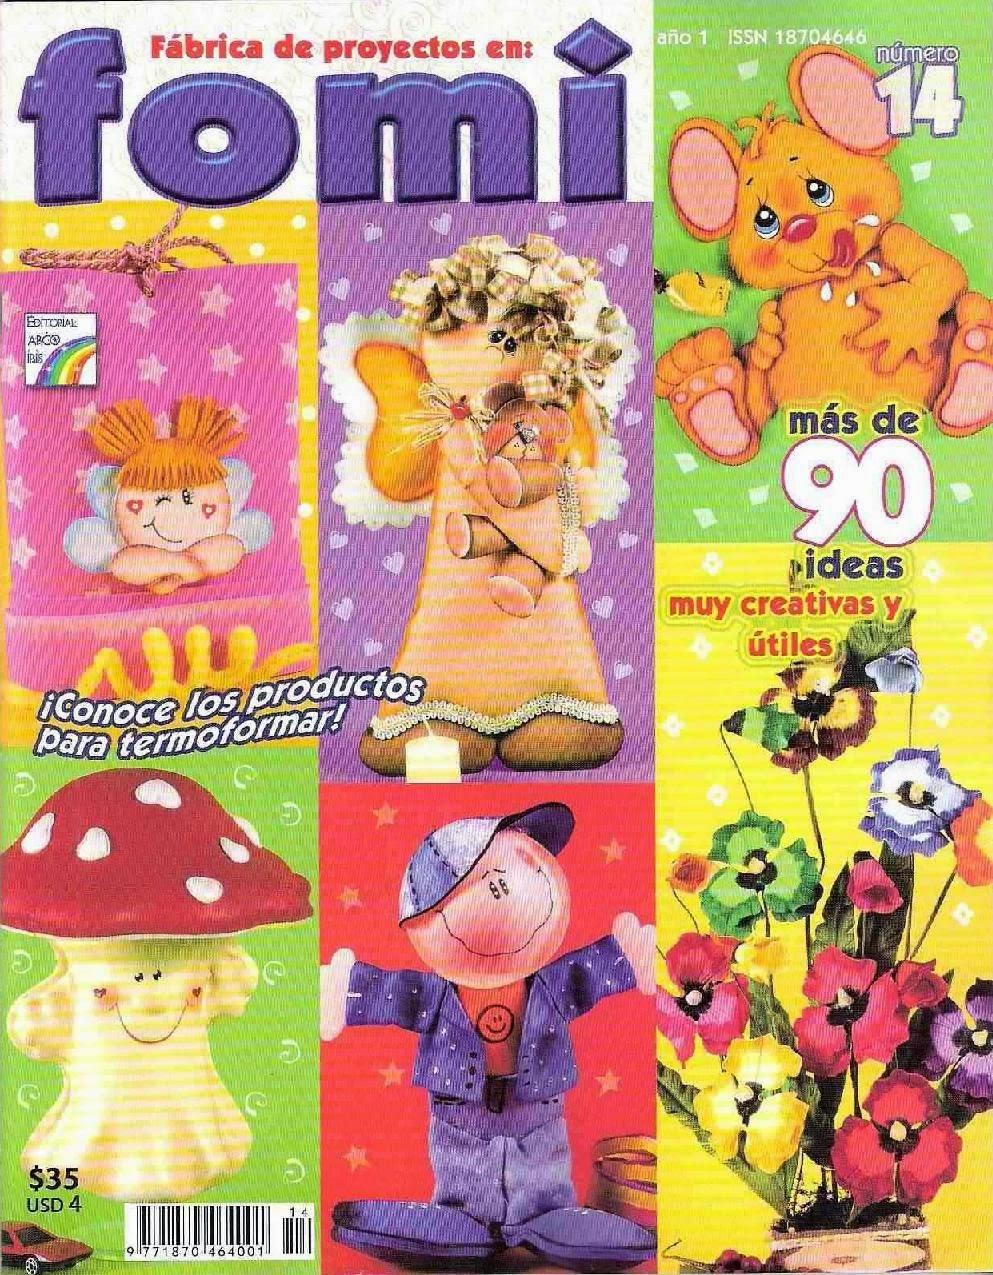 moldes para muñecos en foami - <datvara:blog.title></datvara:blog ...